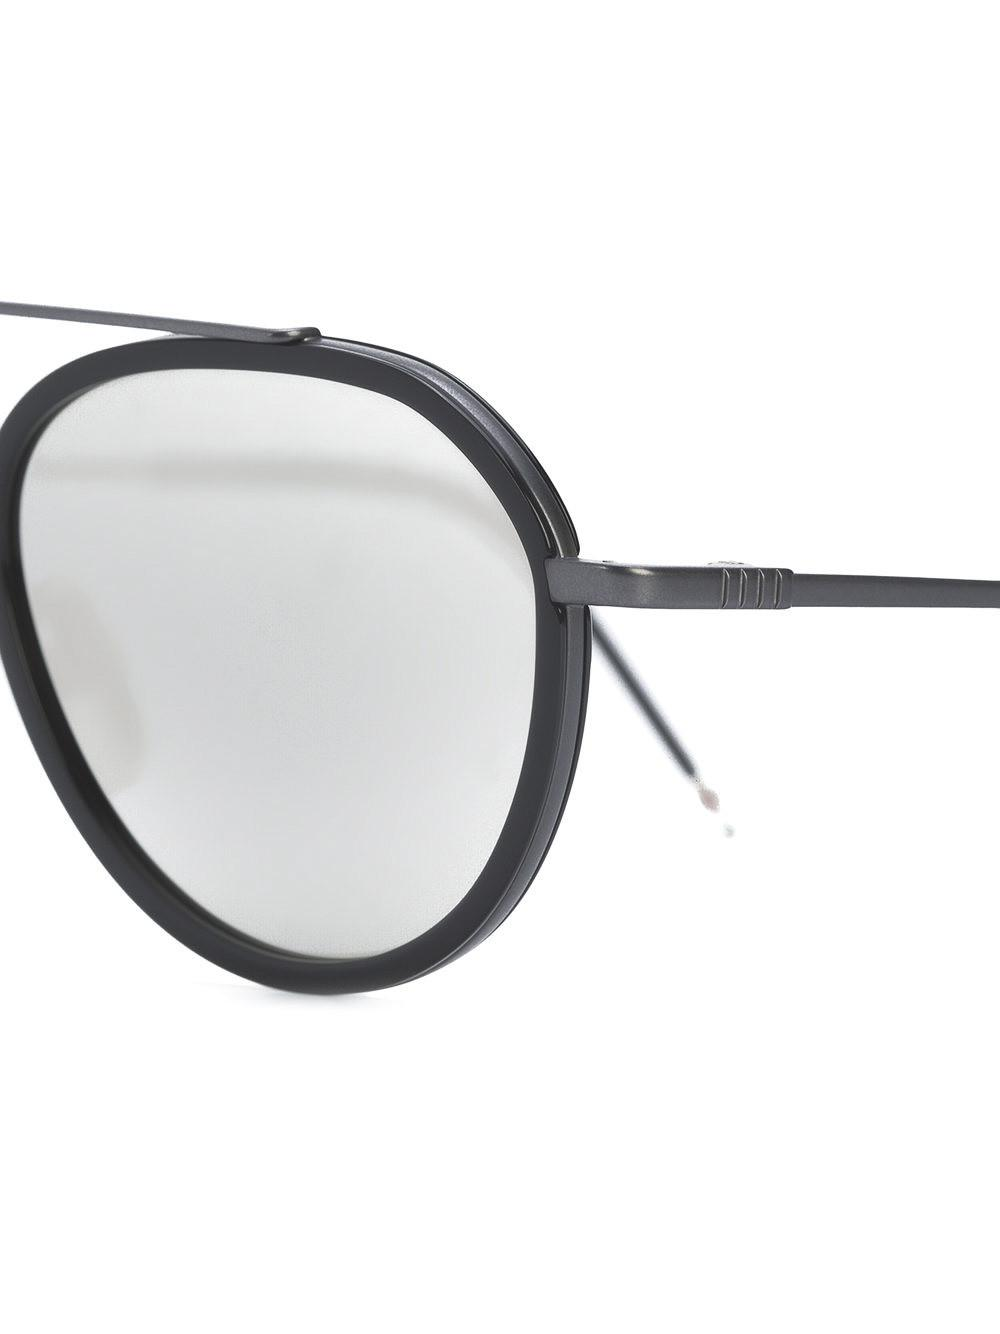 Thom Browne Pilot Sunglasses